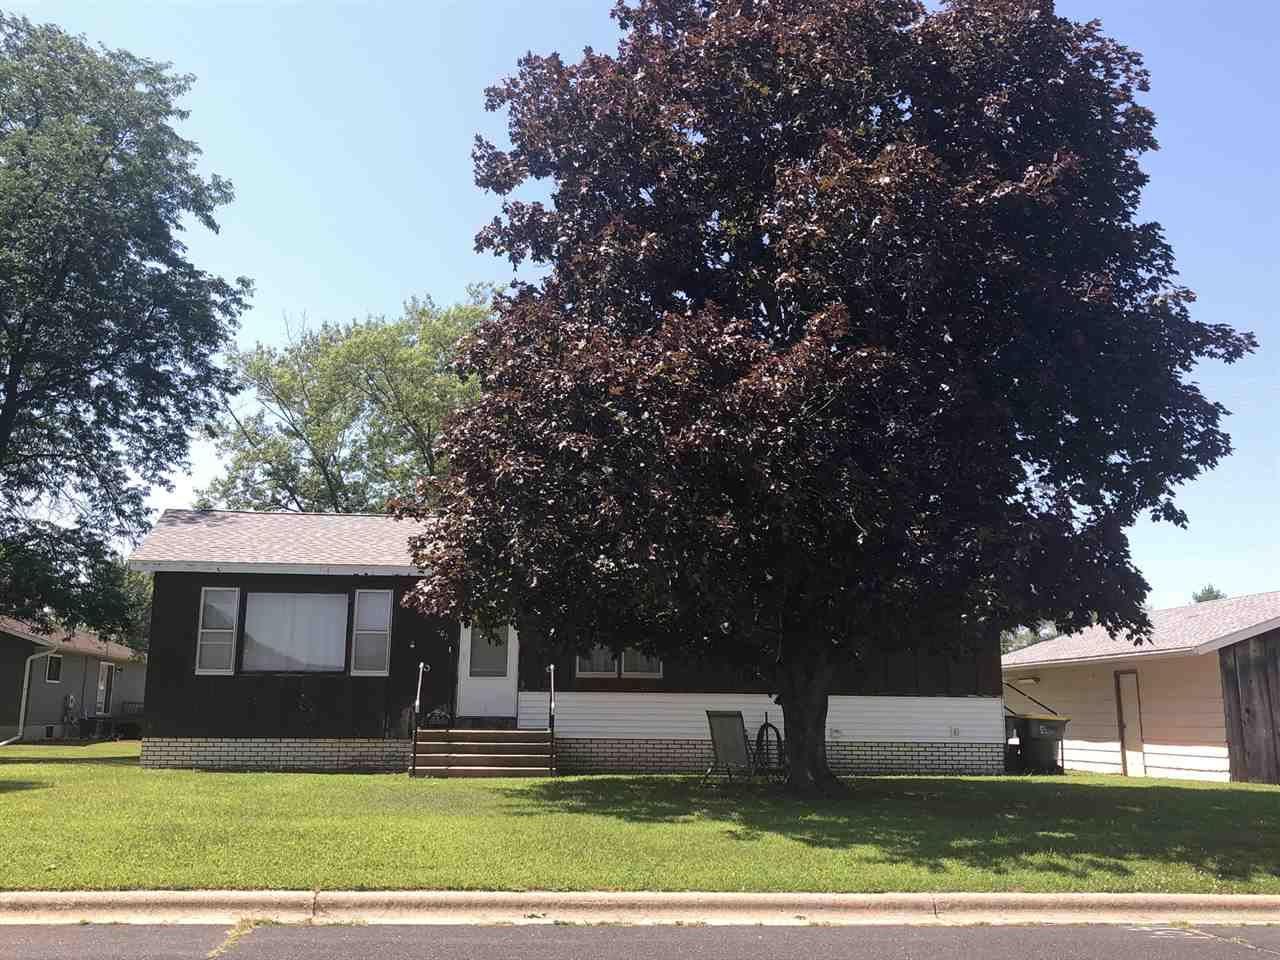 402 Cedar Rd, Boscobel, WI 53805 - #: 1889368